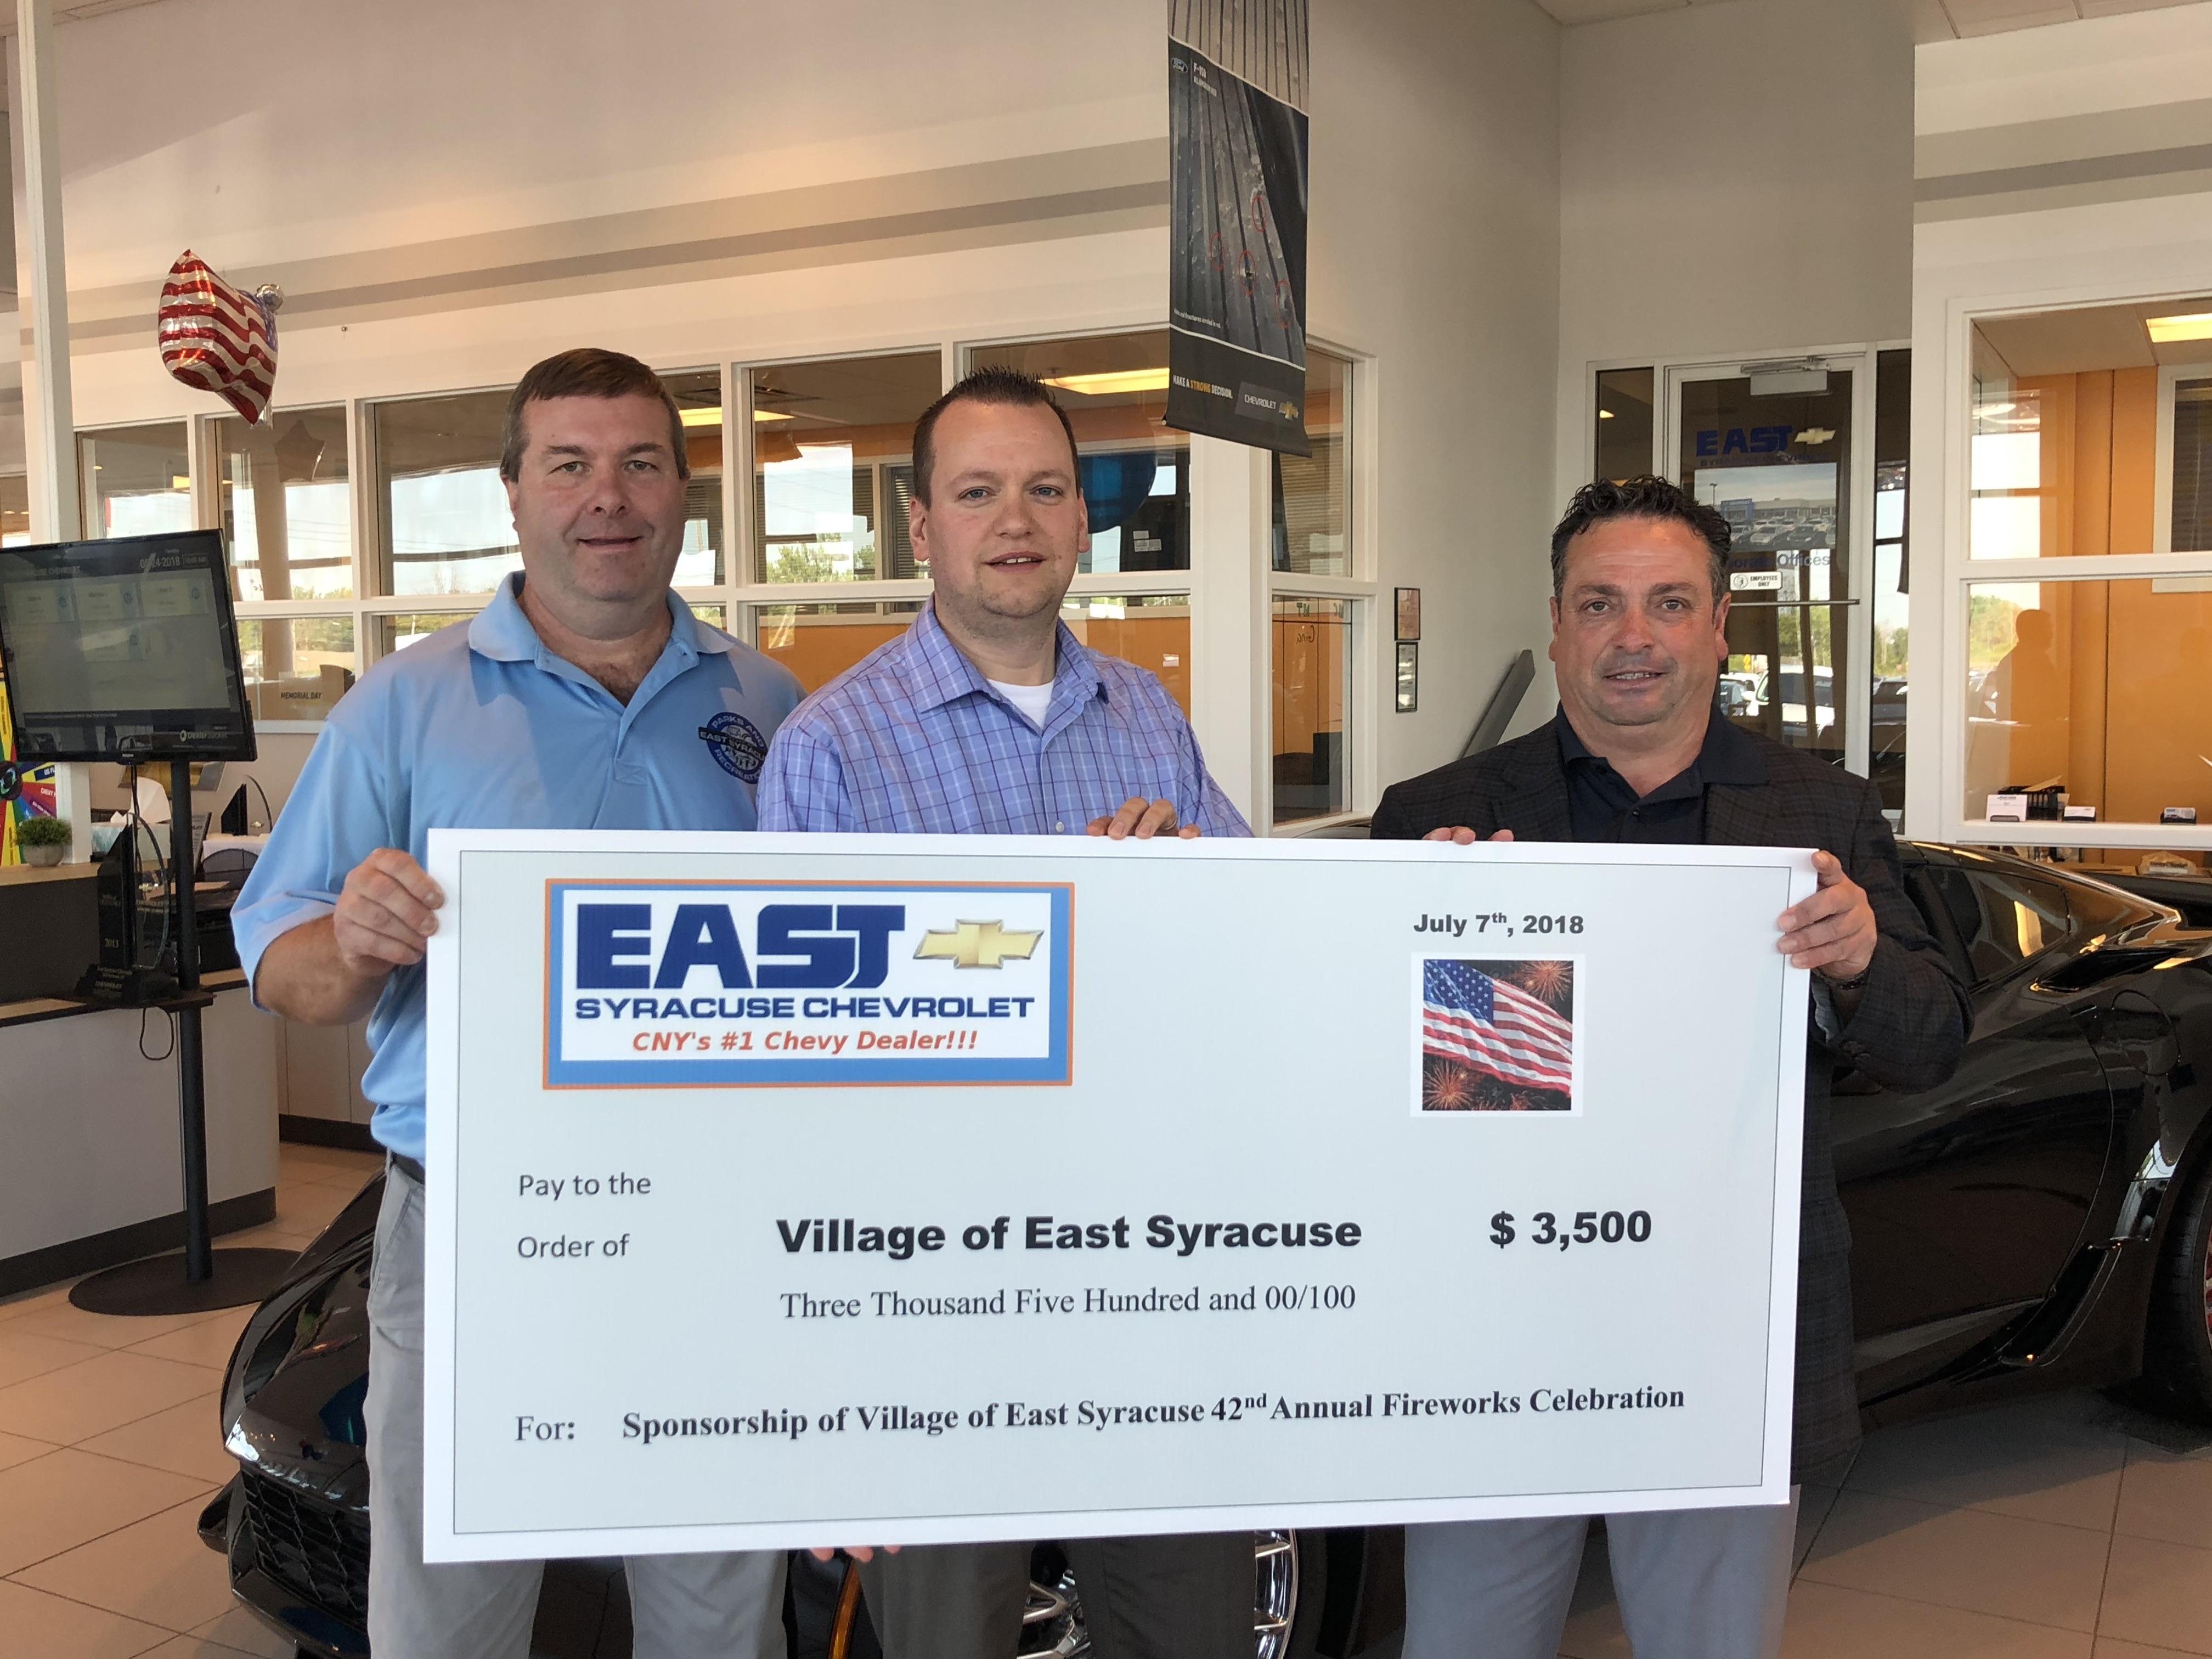 Eagle News line – East Syracuse Chevrolet sponsors village fireworks